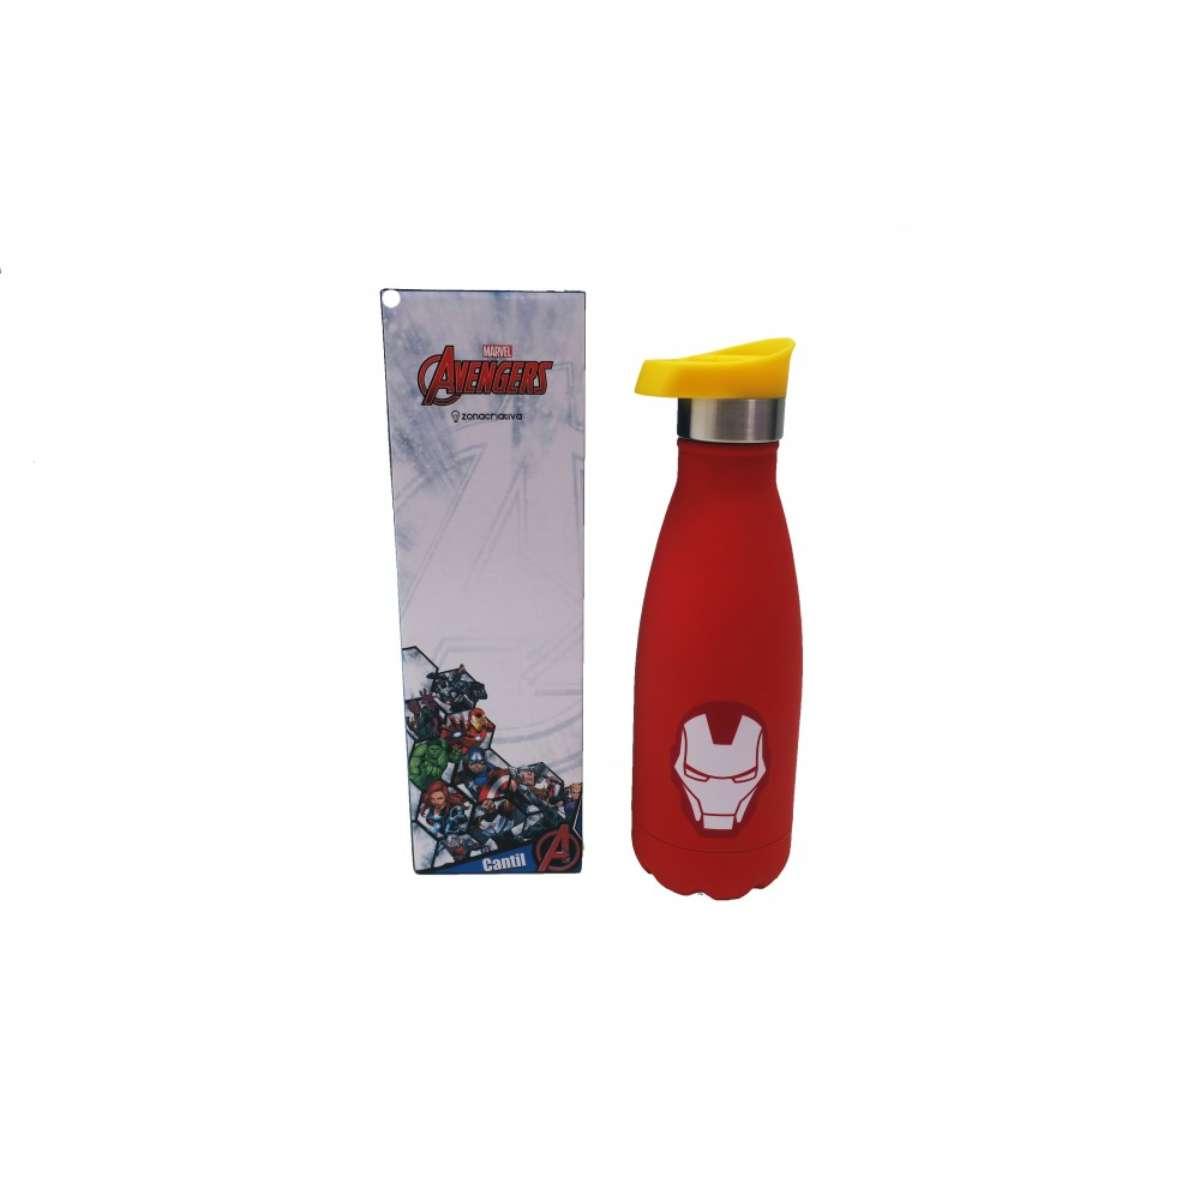 Garrafa Cantil Térmica Fosca Homem de Ferro 350 ml